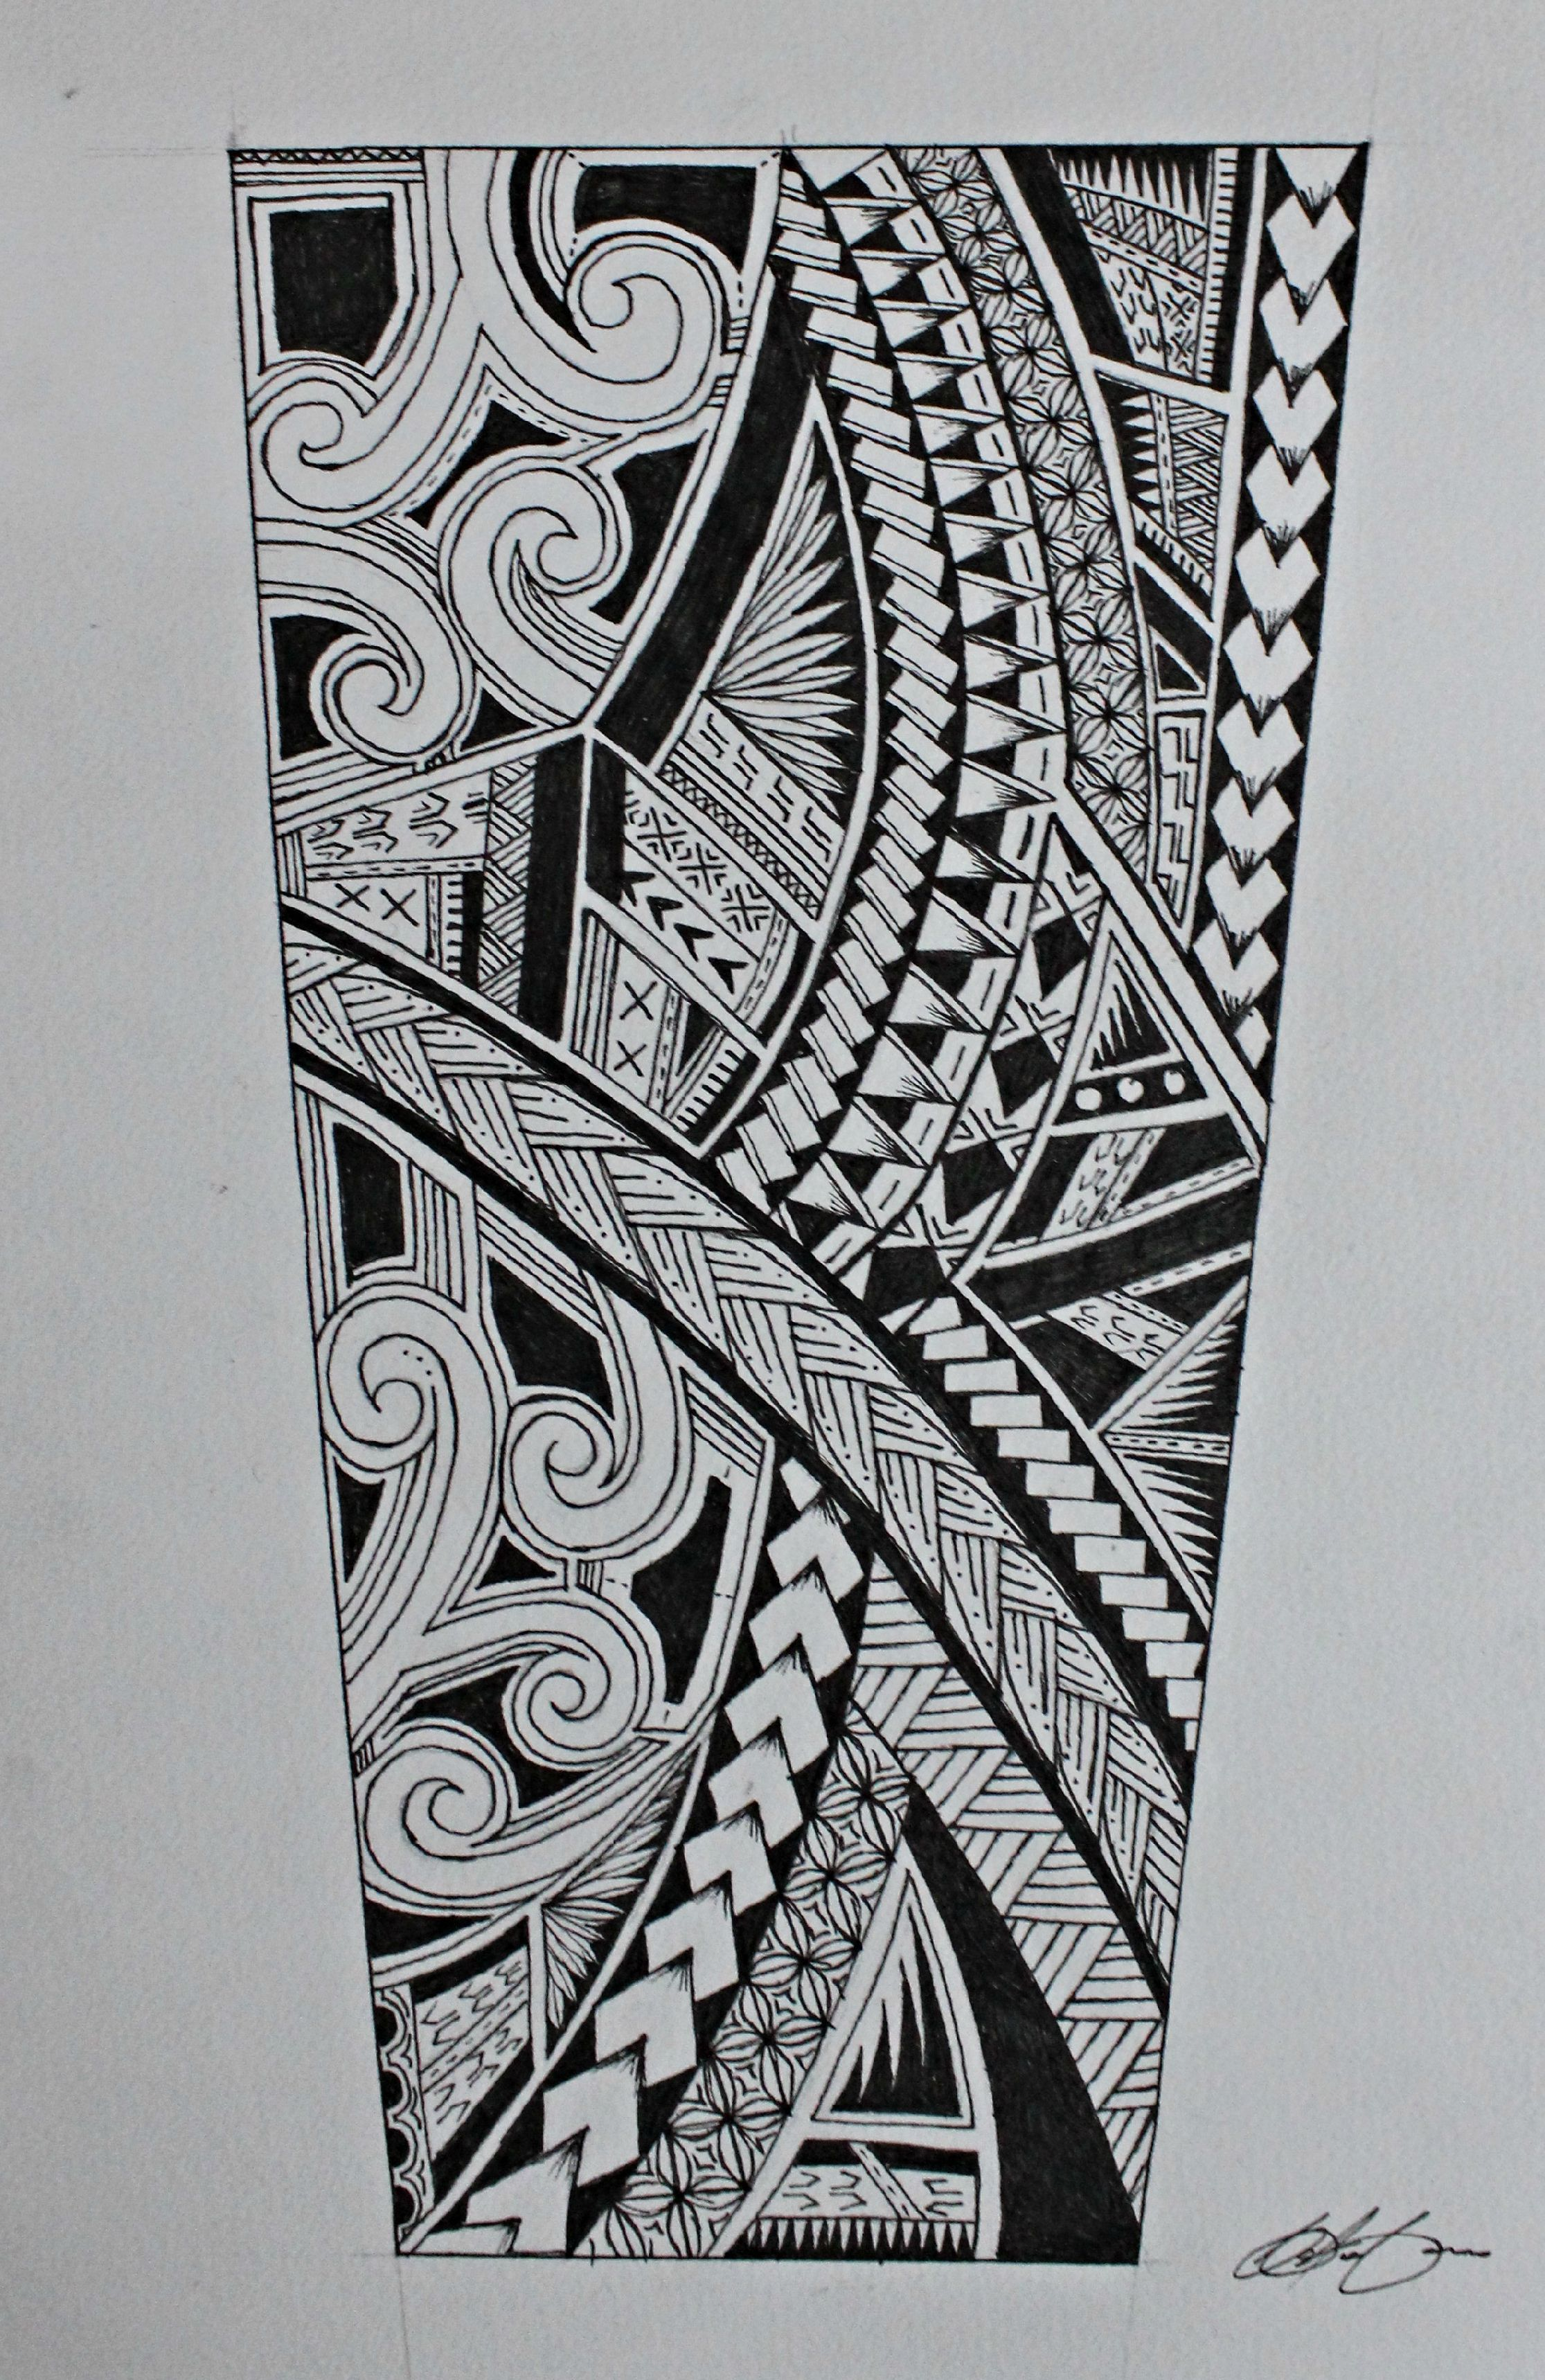 Forearm Tattoo Samoantattoos Samoan Tattoos Maori Tattoo Arm